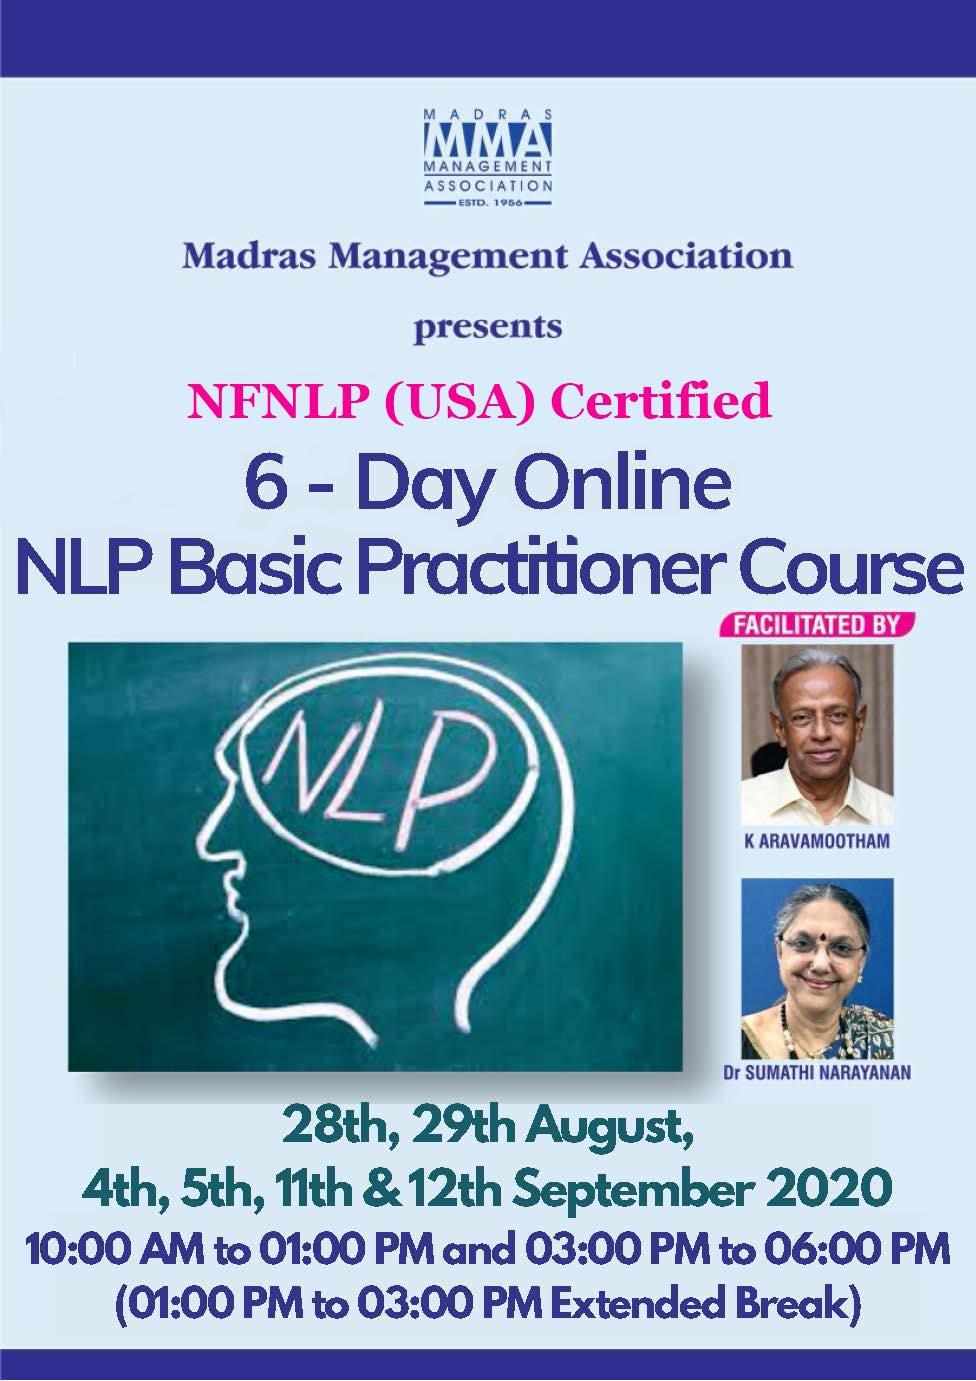 NFNLP's NLP Trainers - K. Aravamootham, Gold Master Trainer